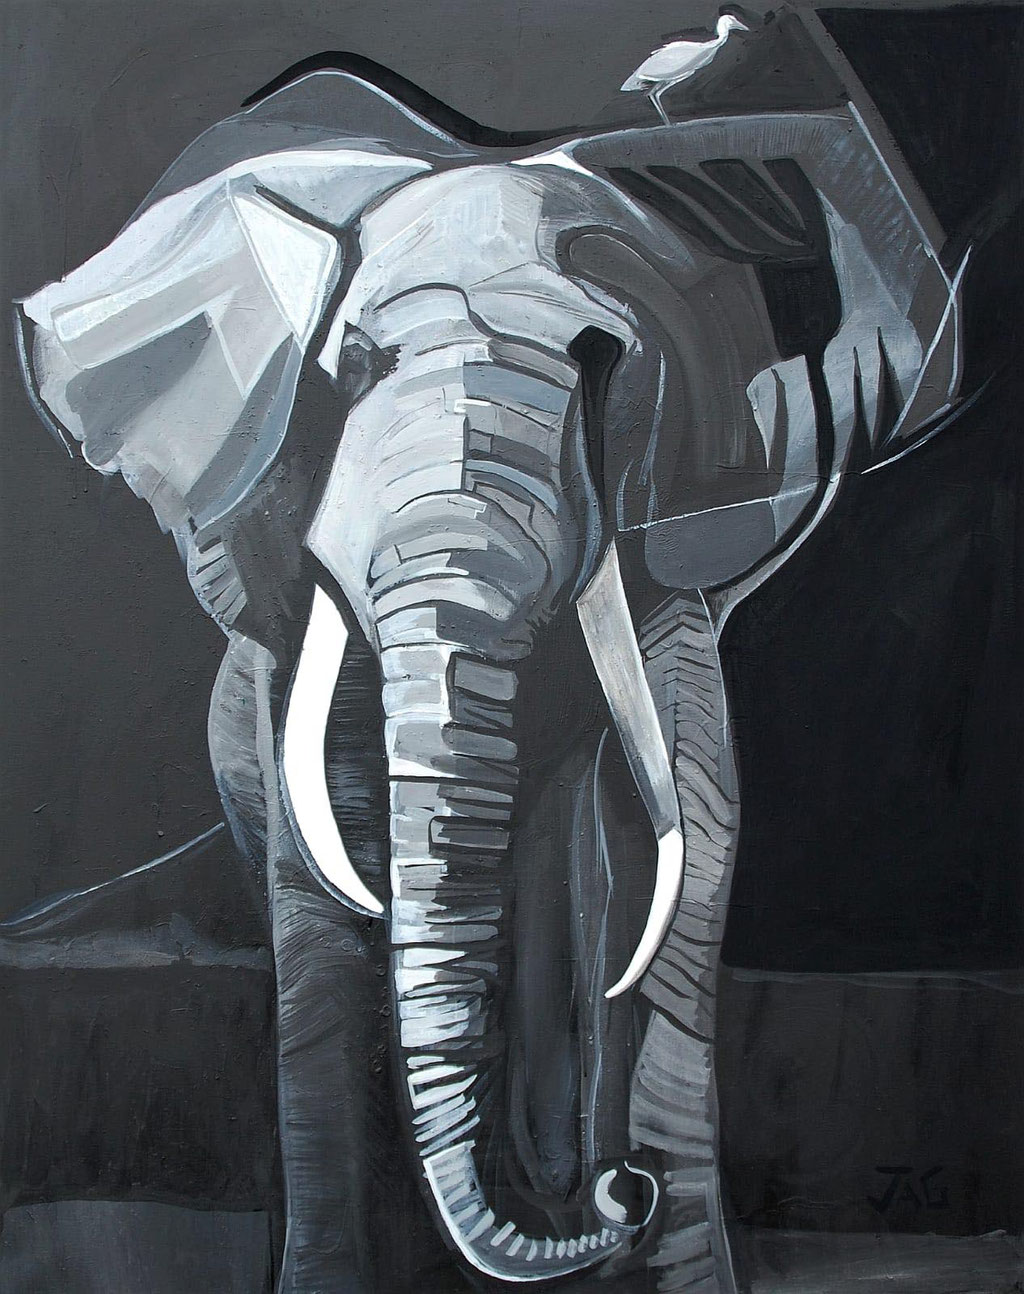 'Eleanor' acrylic on canvas 2020, 123 x 153cm - SOLD